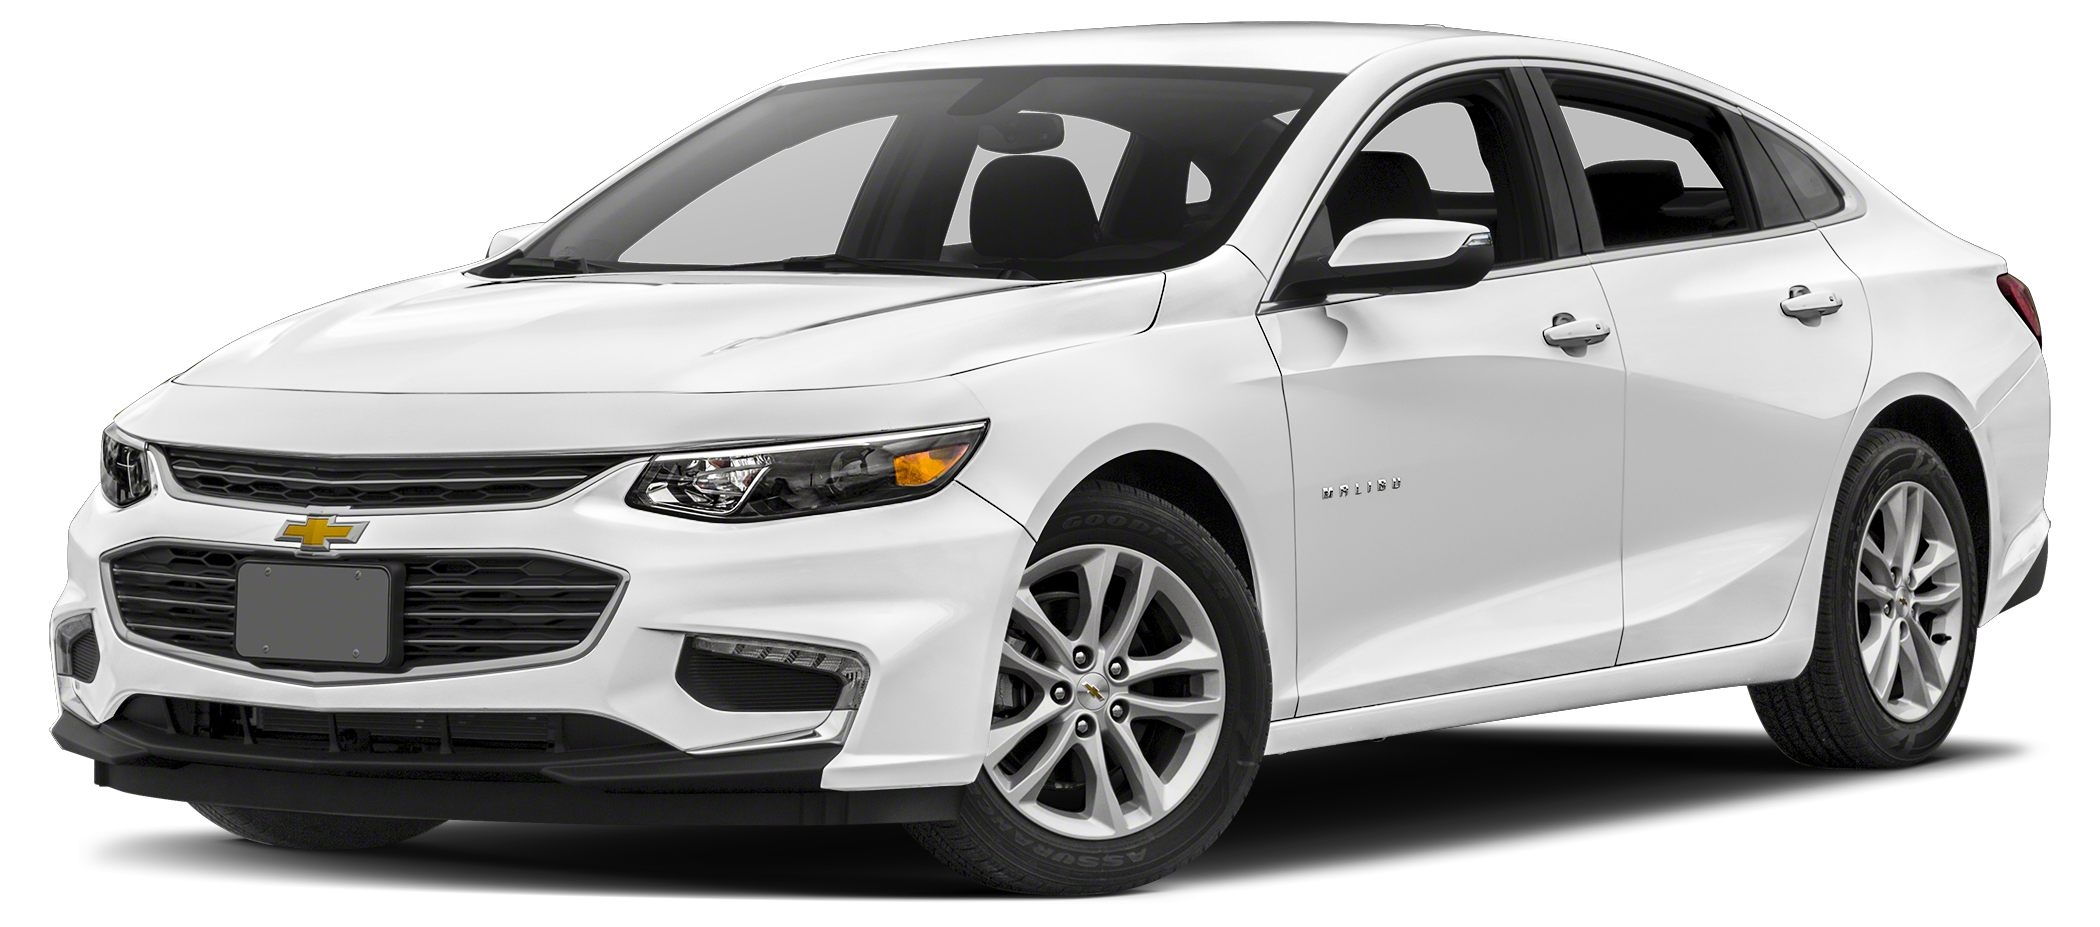 2016 Chevrolet Malibu LT w1LT LT trim SUMMIT WHITE exterior and JET BLACK interior FUEL EFFICIE